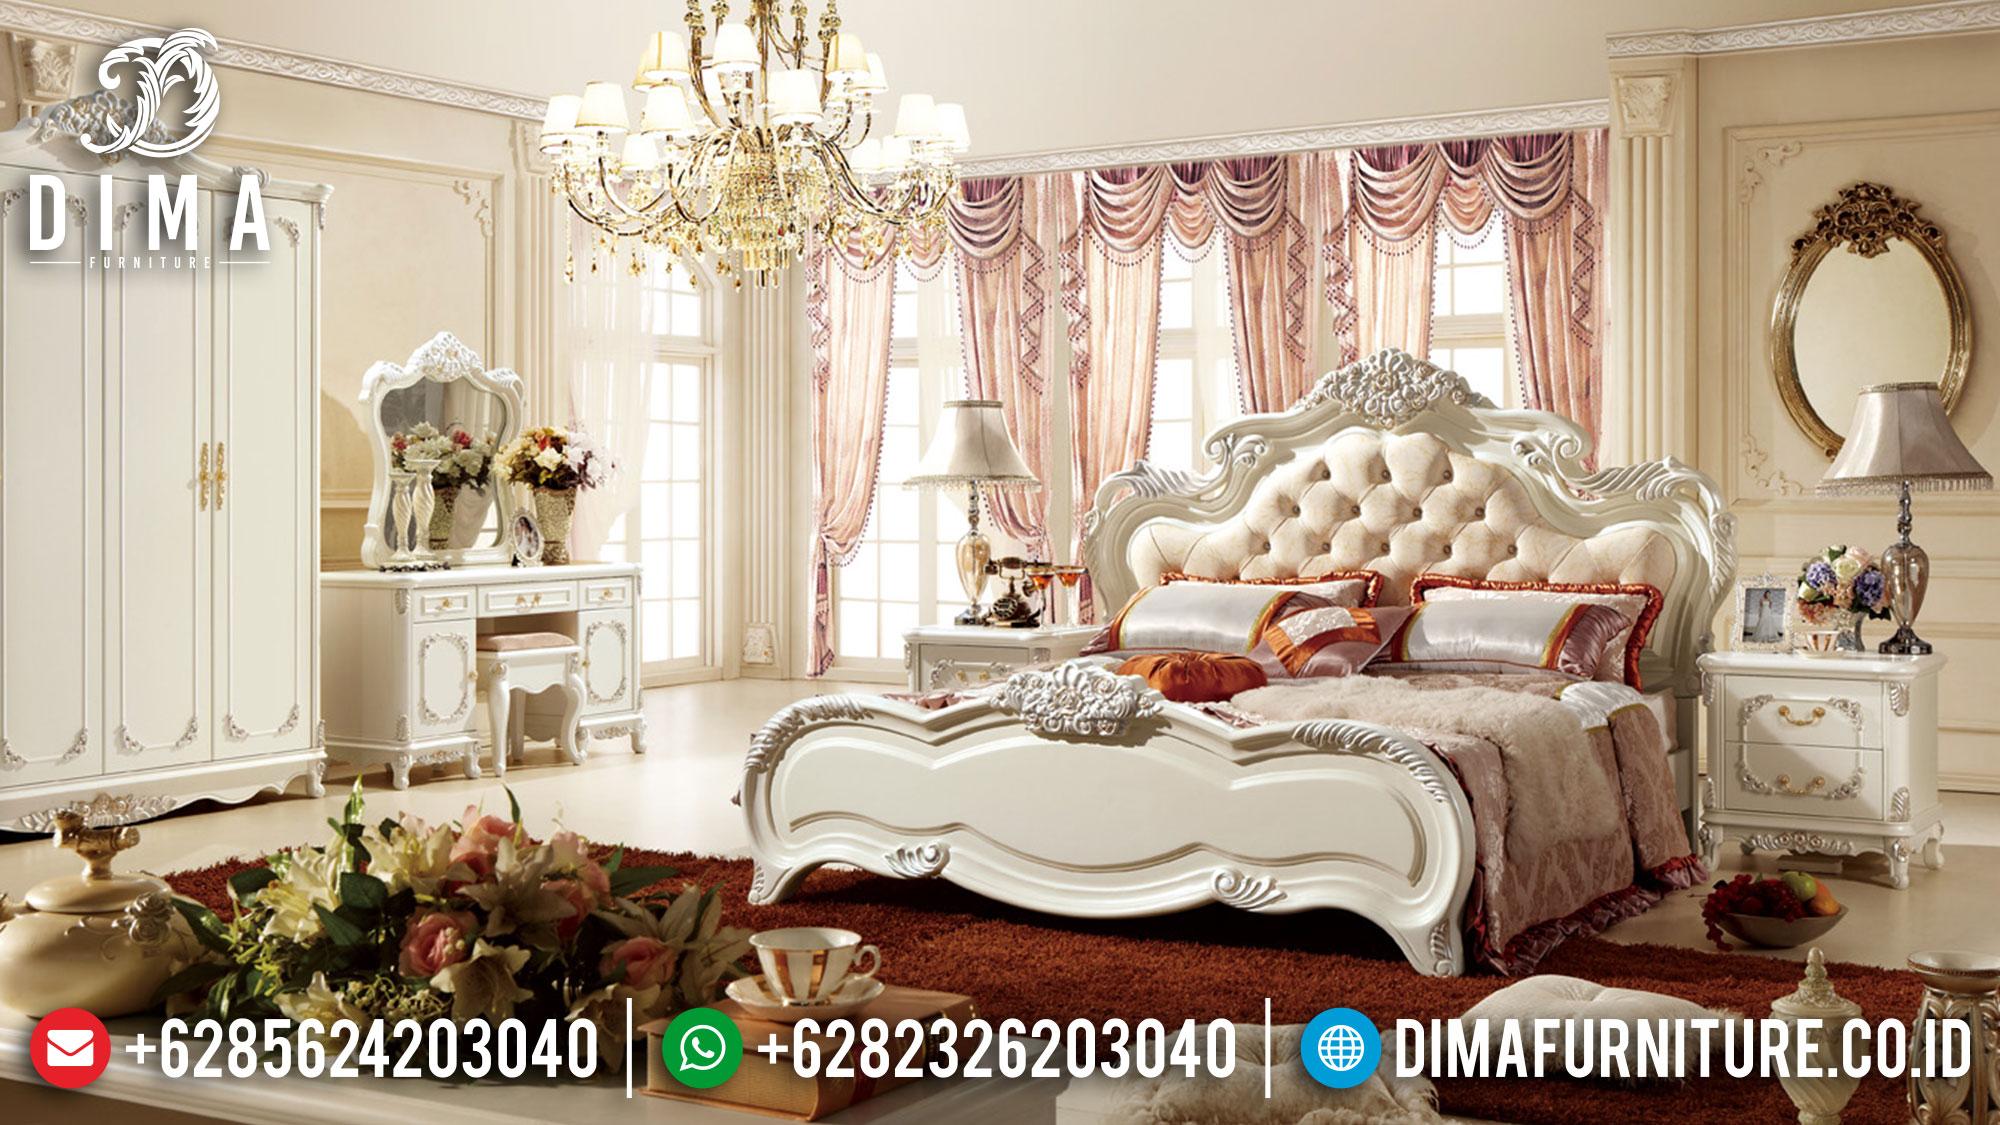 New Desain Kamar Set Mewah Jepara Luxury Carving Majestic Room Concept ST-1144